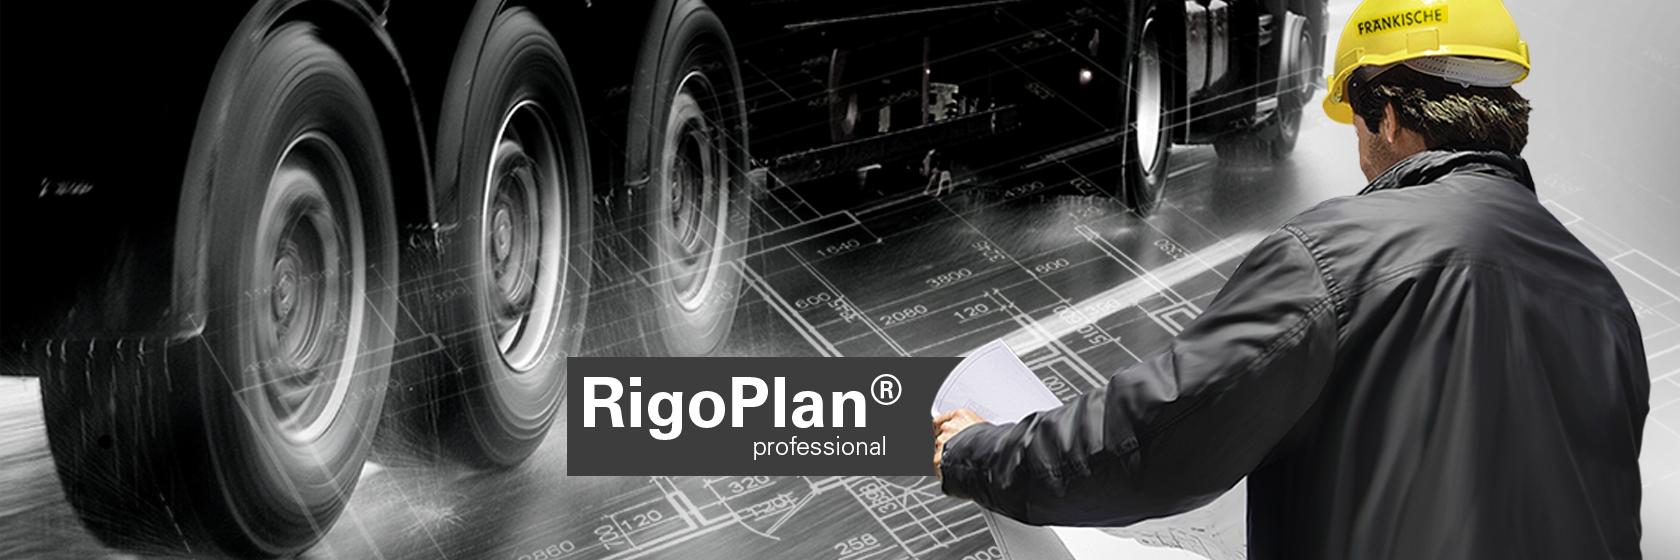 RigoPlan 6.40 - Berechnungssoftware